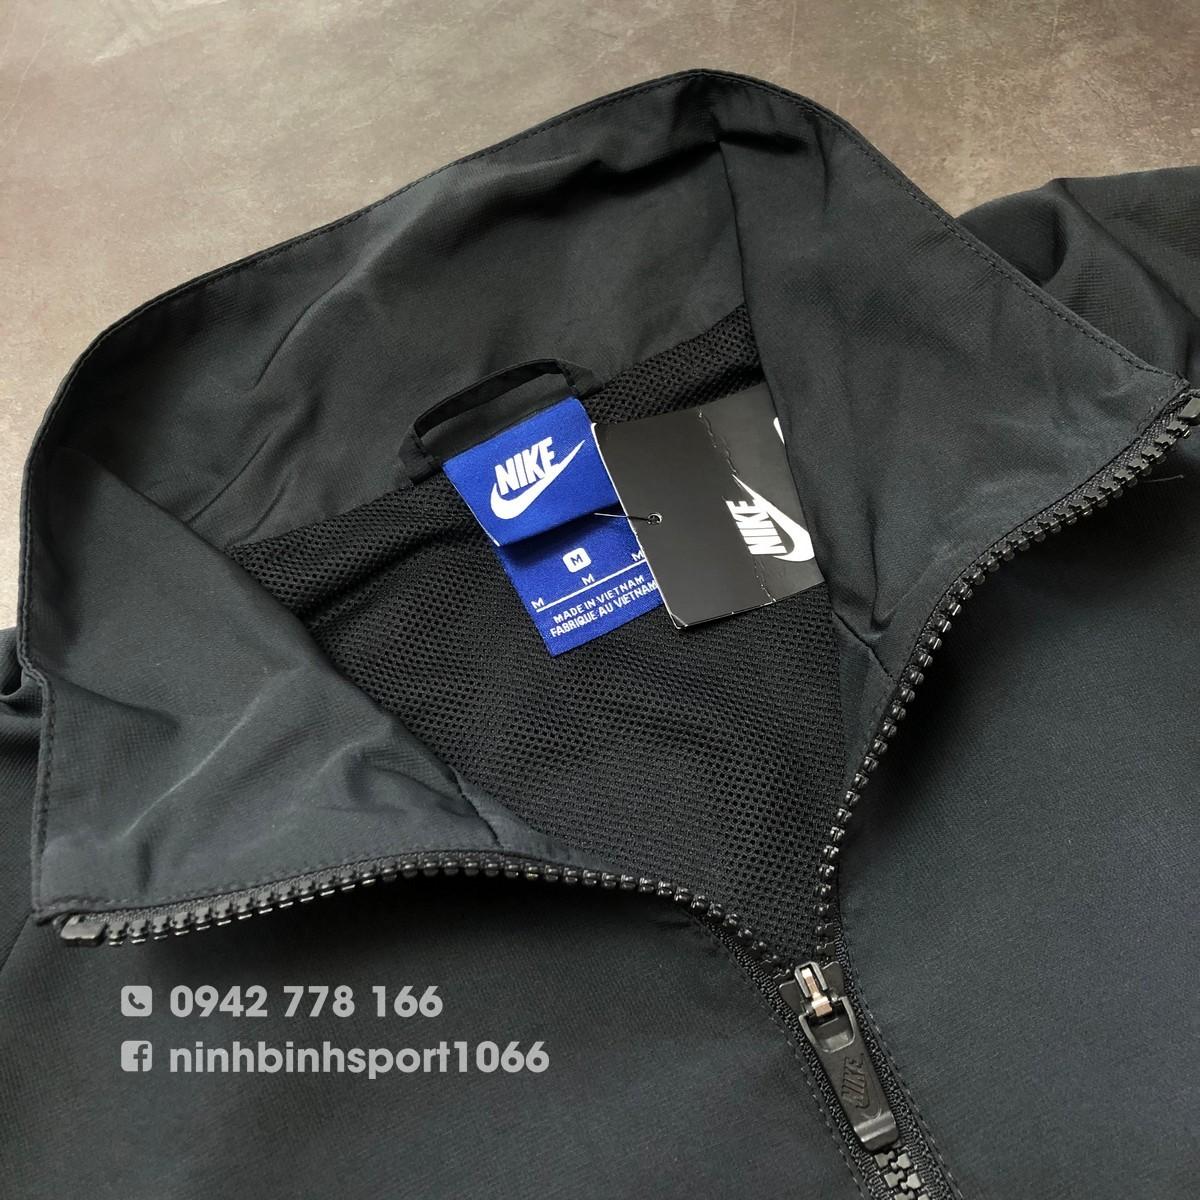 Bộ thể thao nam Nike Sportswear Tracksuit 861778-010